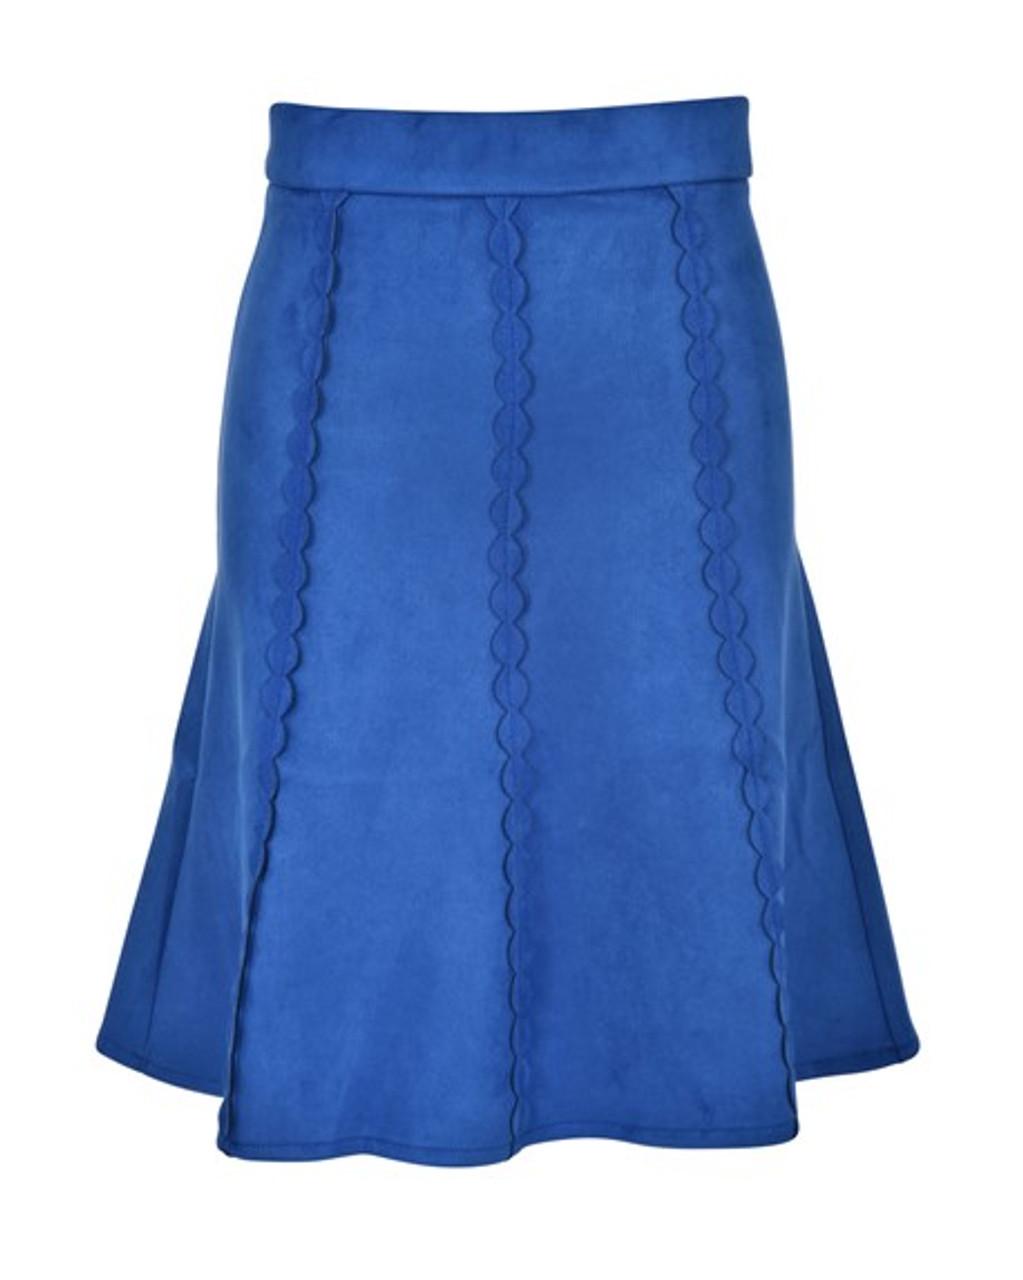 BGDK Suede Kids Panel Skirt